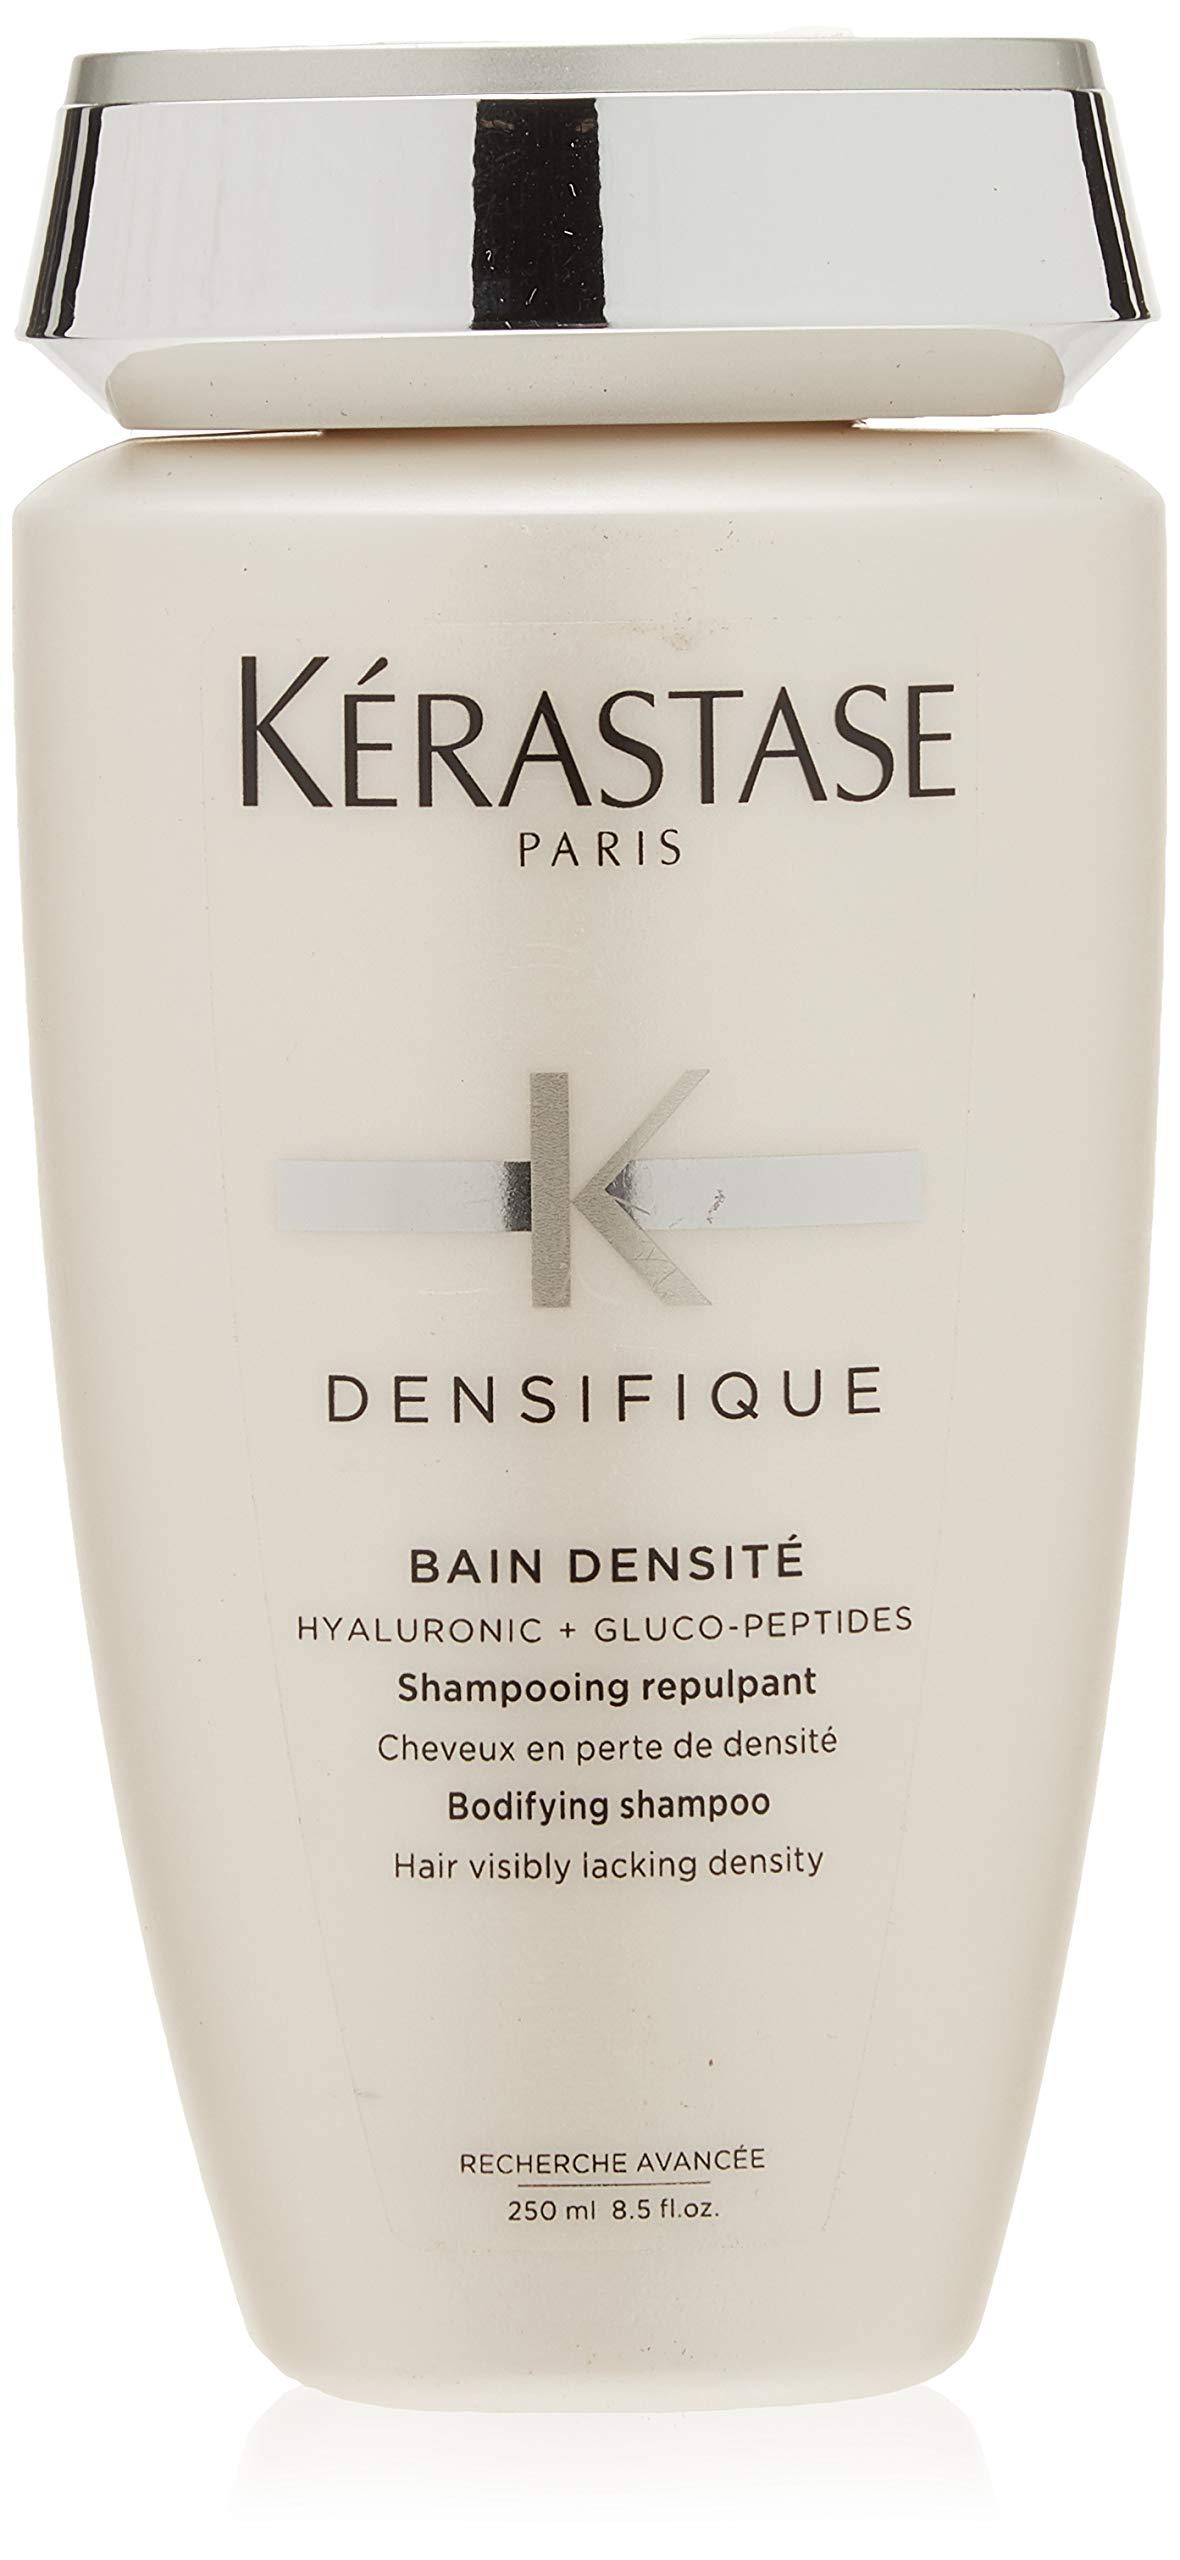 Kerastase Densifique Bain Densite Bodifying Shampoo (Hair Visibly Lacking Density) 250ml/8.5oz by KERASTASE